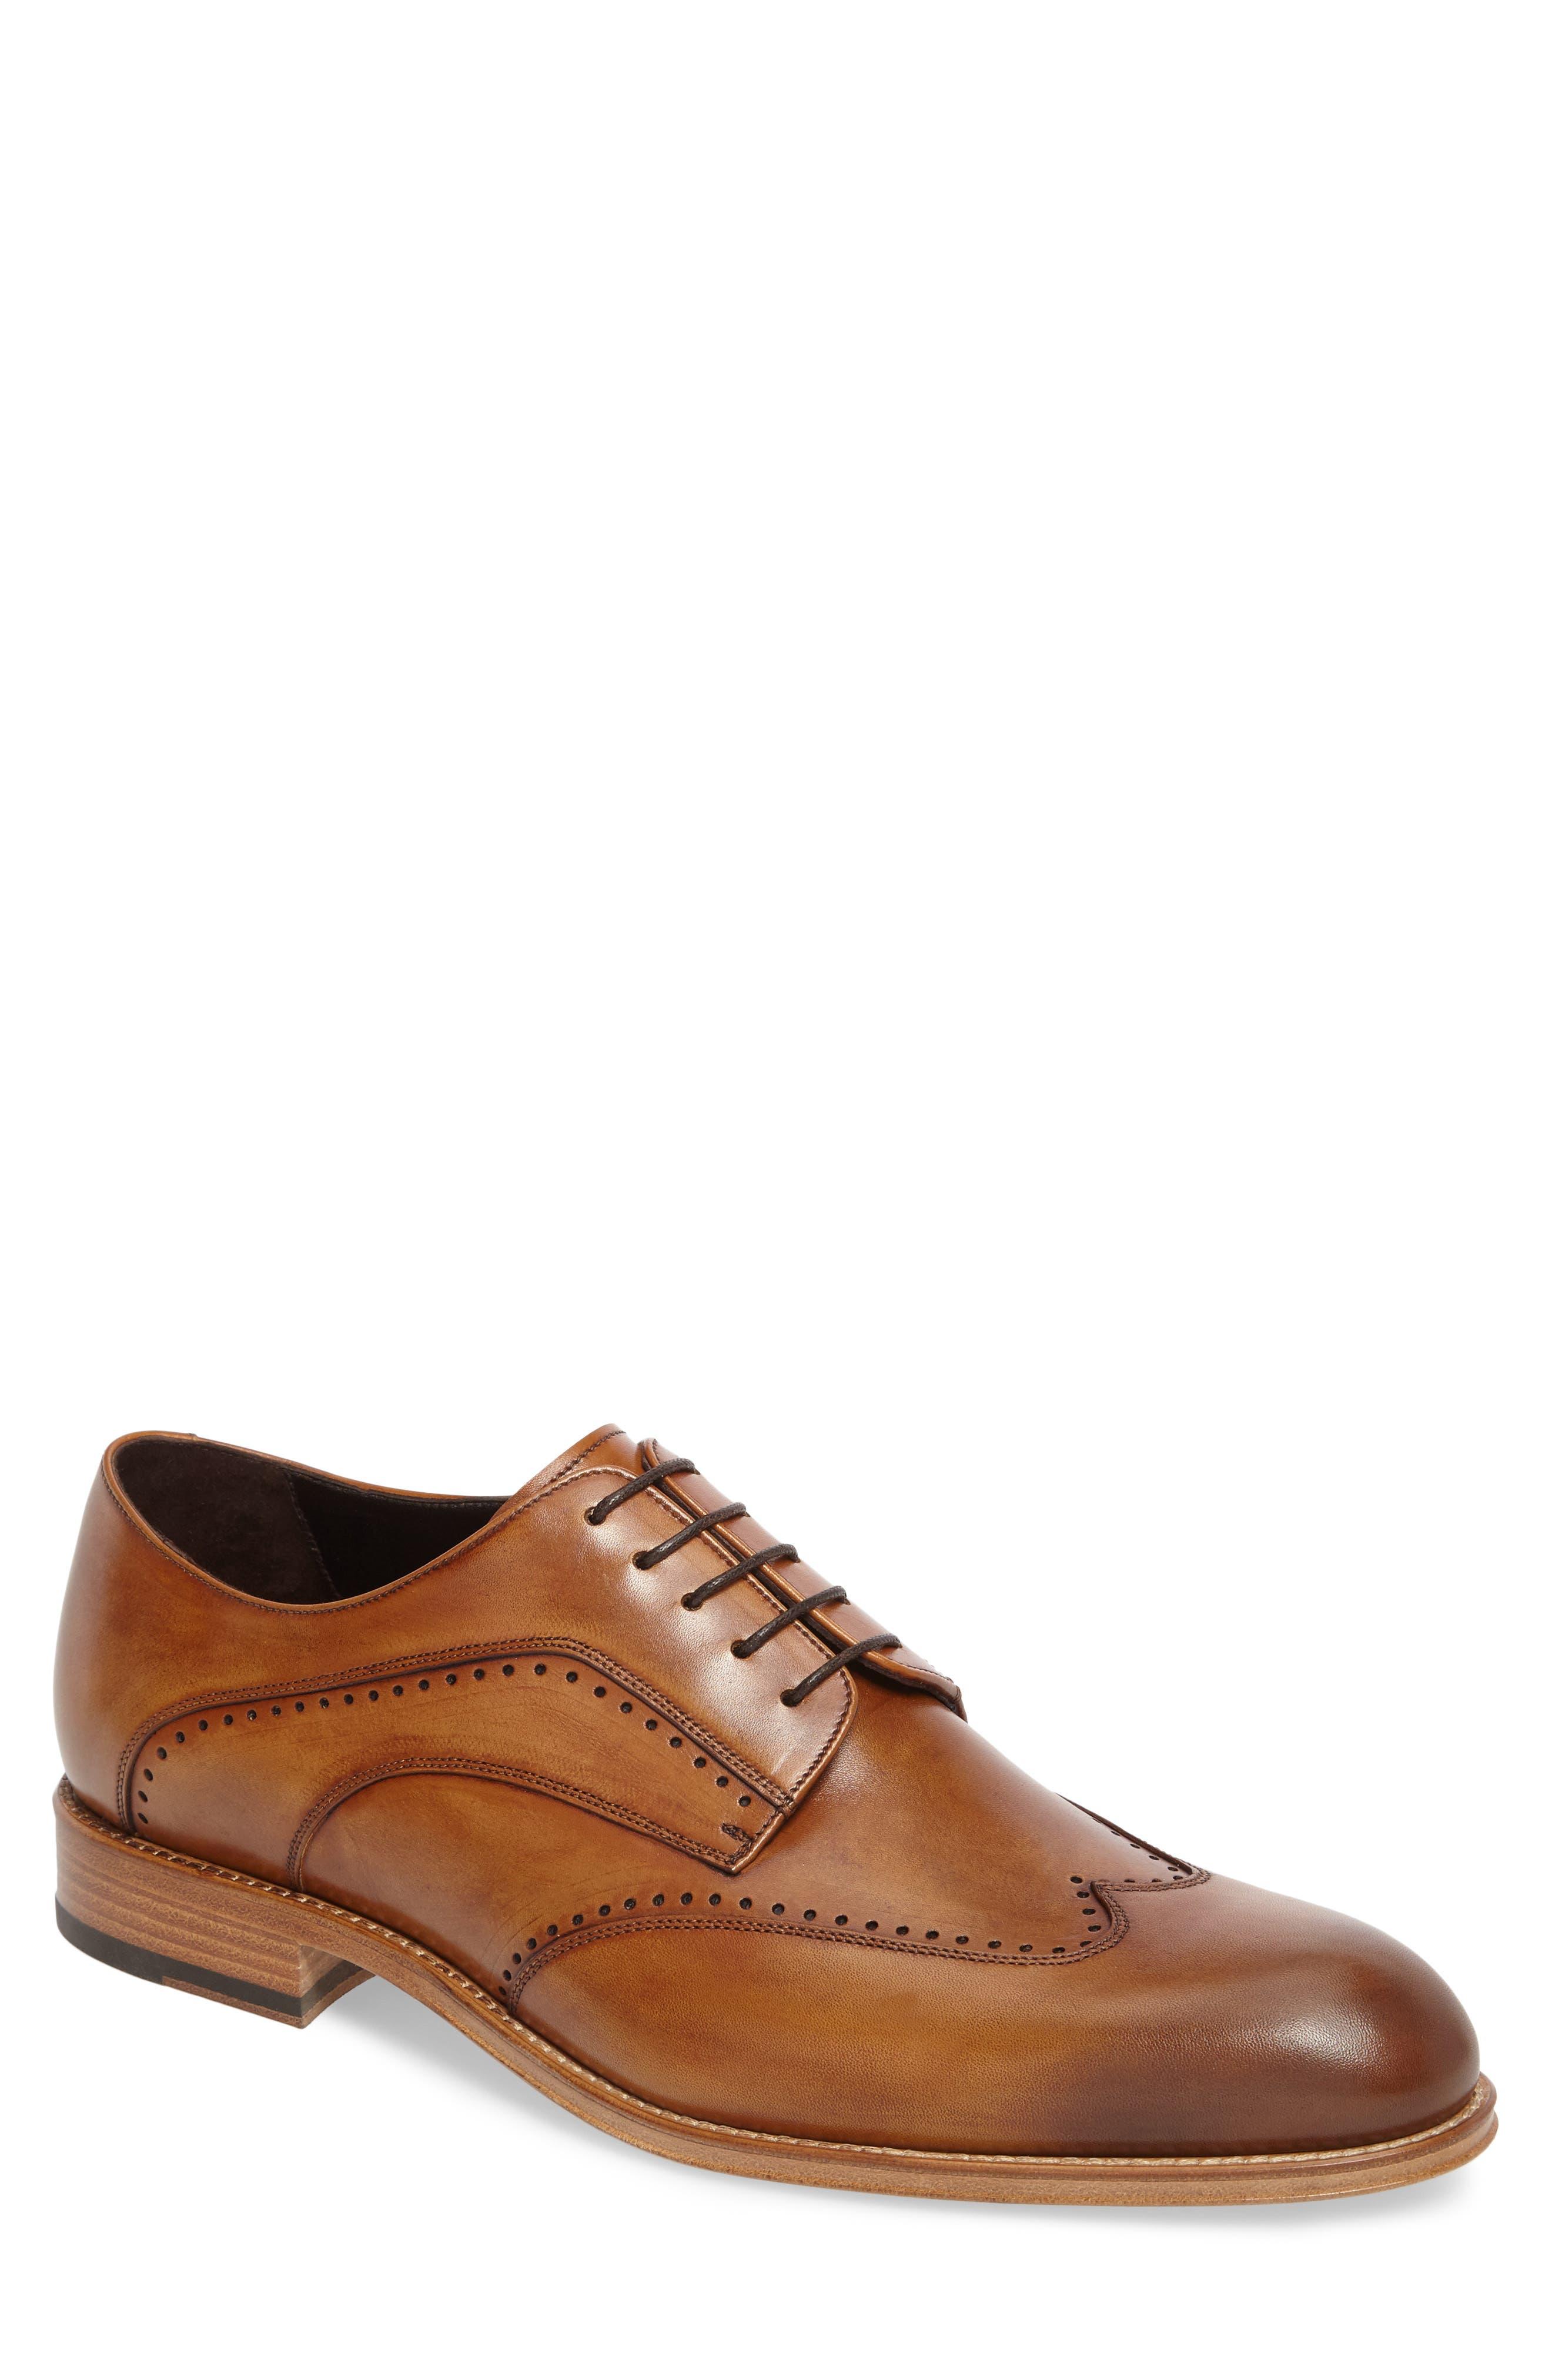 Francesco Wingtip Derby,                         Main,                         color, Tan Leather